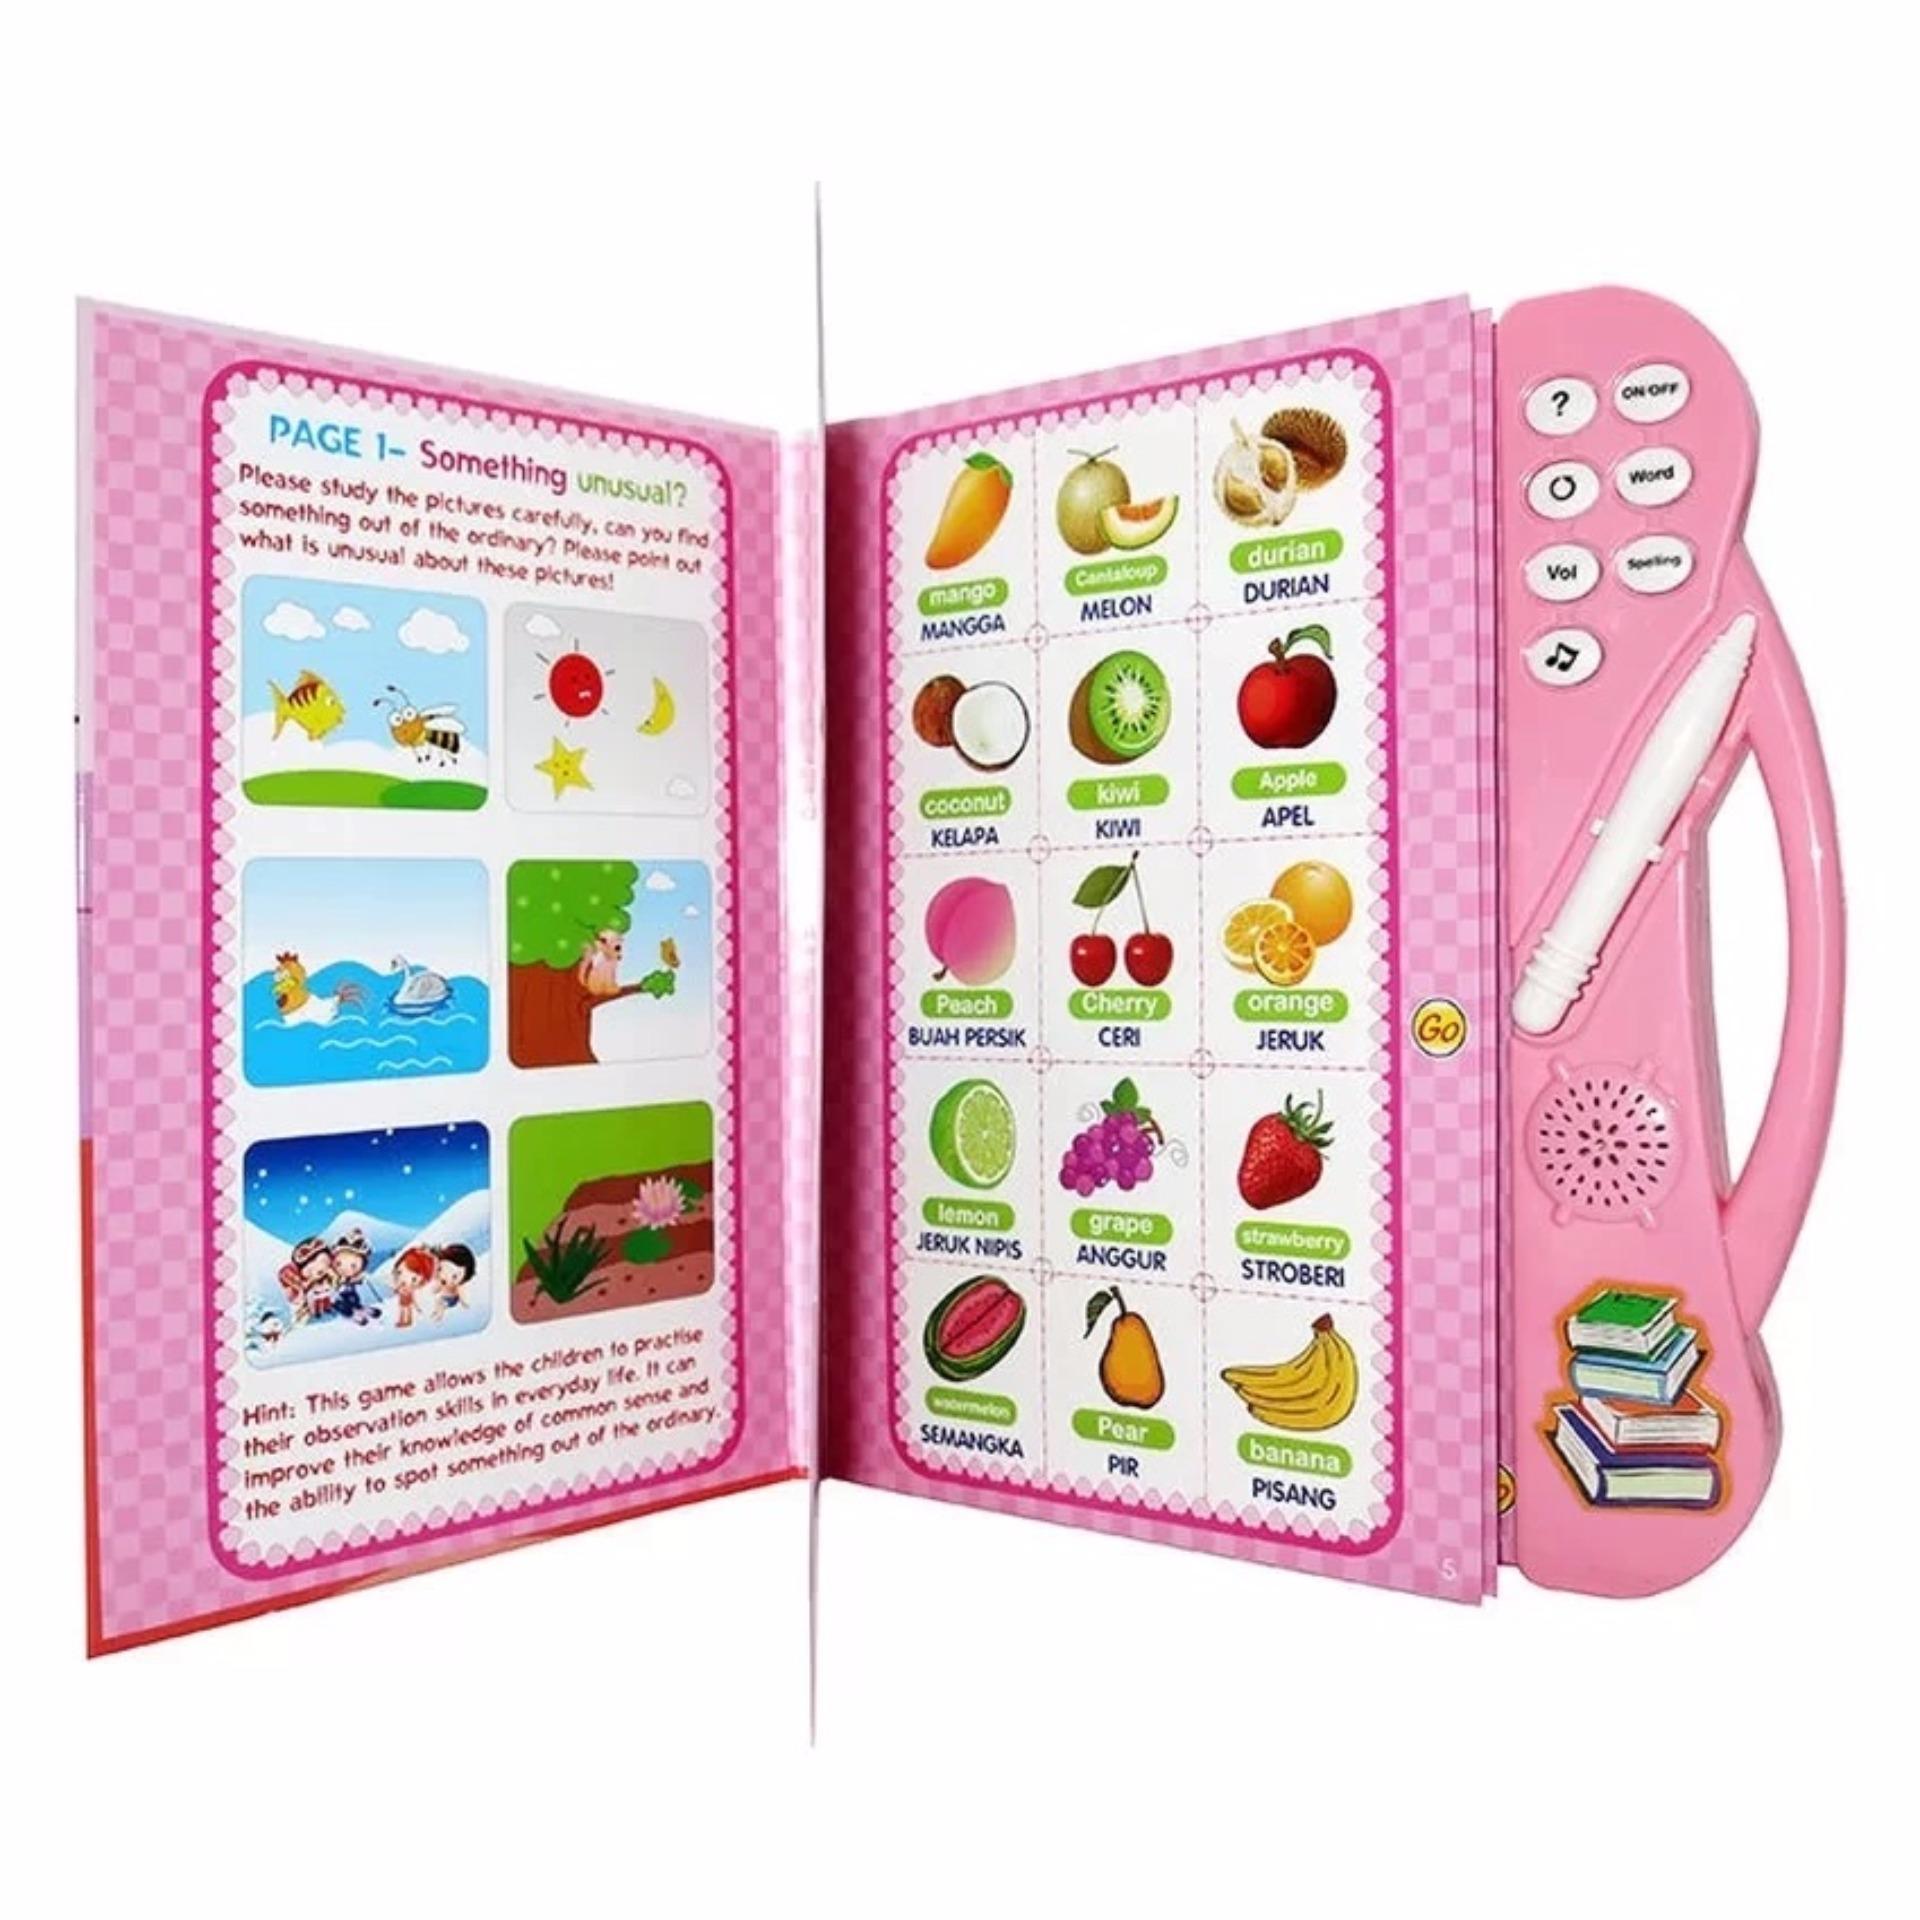 ... Mainan Source · E Book 2 Bahasa Bahasa Indonesia & Bahasa Inggris Pink